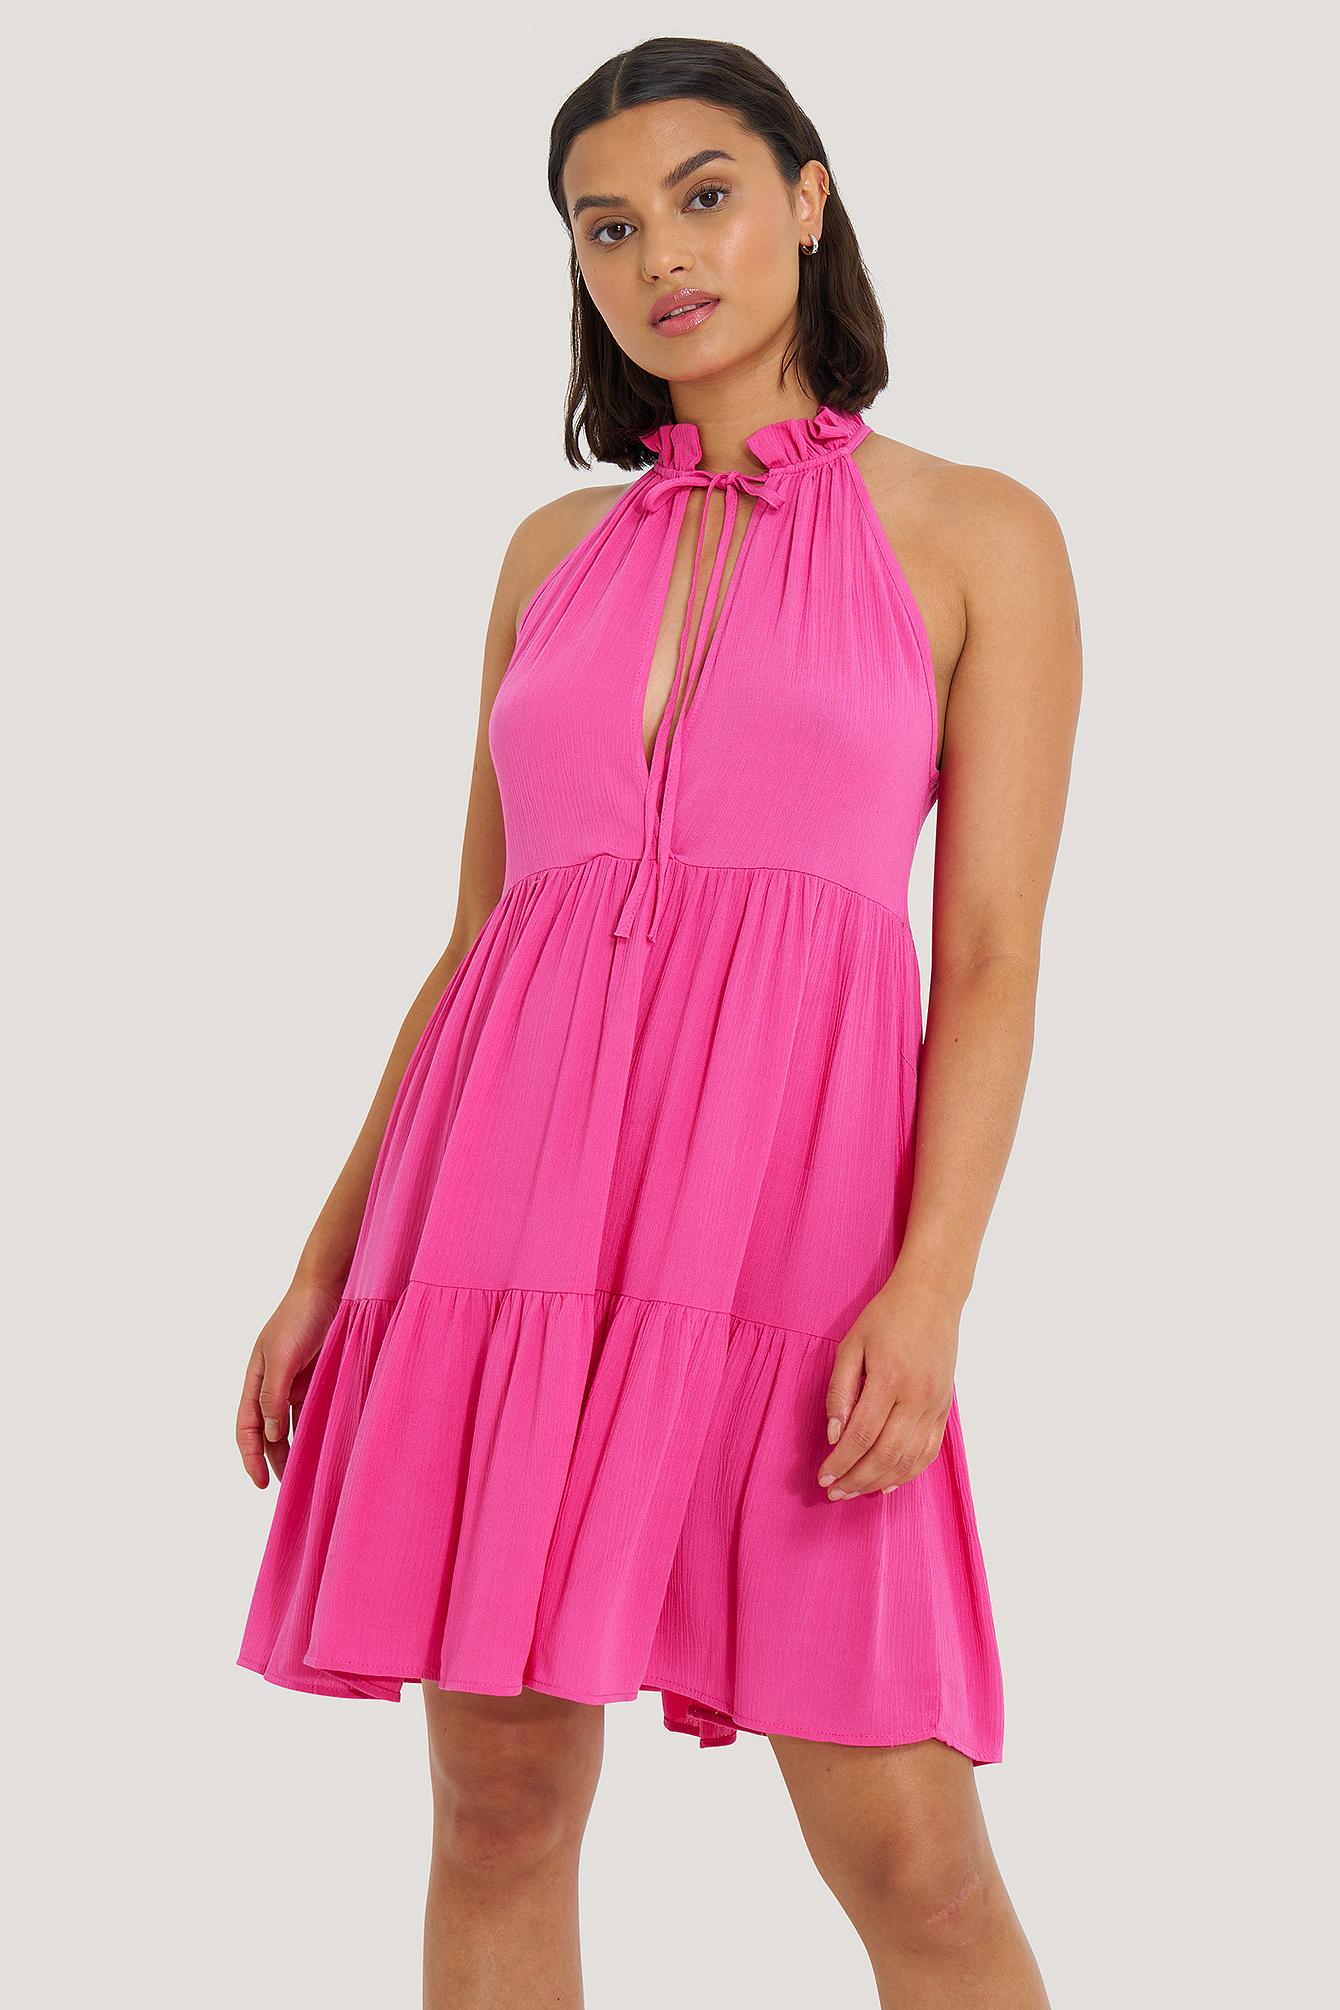 trendyol -  Nackenhalter-Kleid - Pink